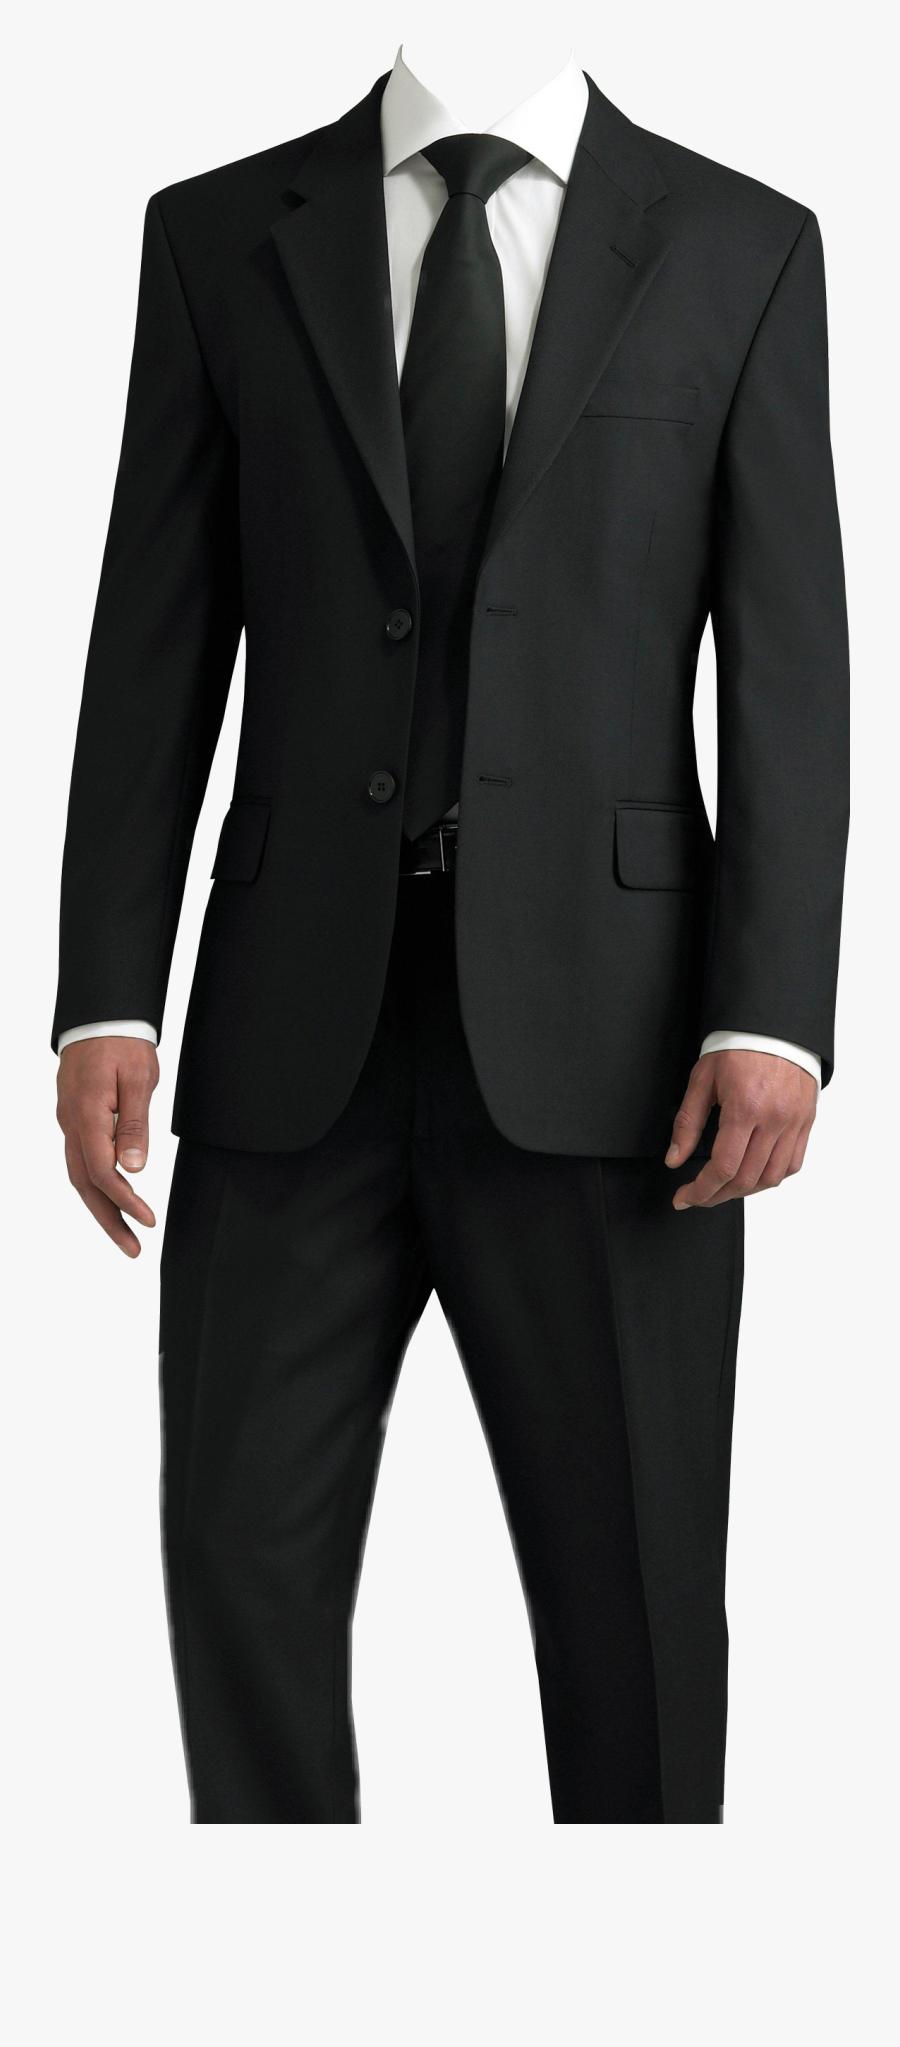 Png Suit And Tie No Background - Suit Images For Photoshop, Transparent Clipart